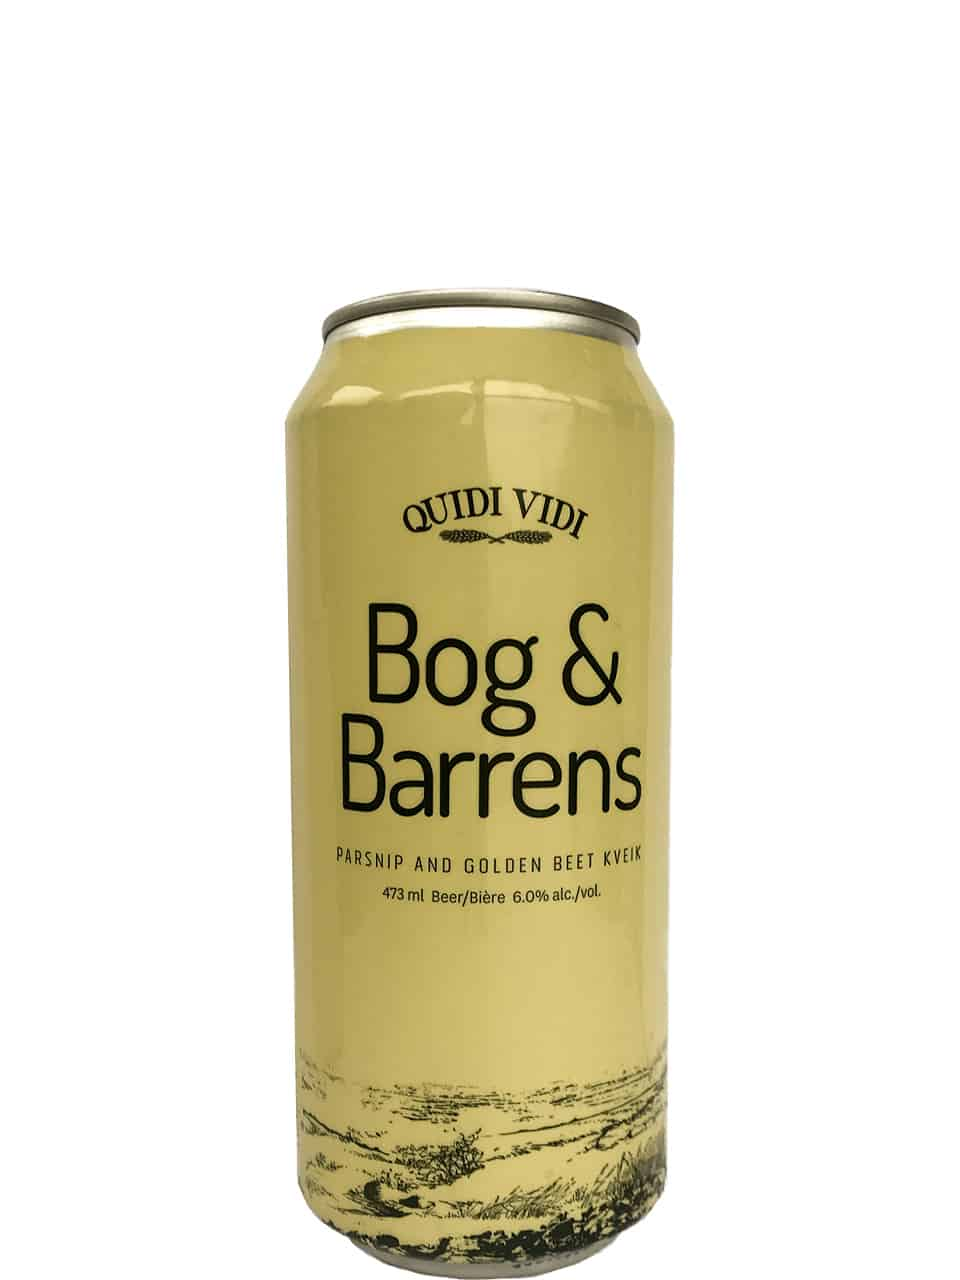 Quidi Vidi Bog & Barrens Parsnip&Golden Beer Kveik